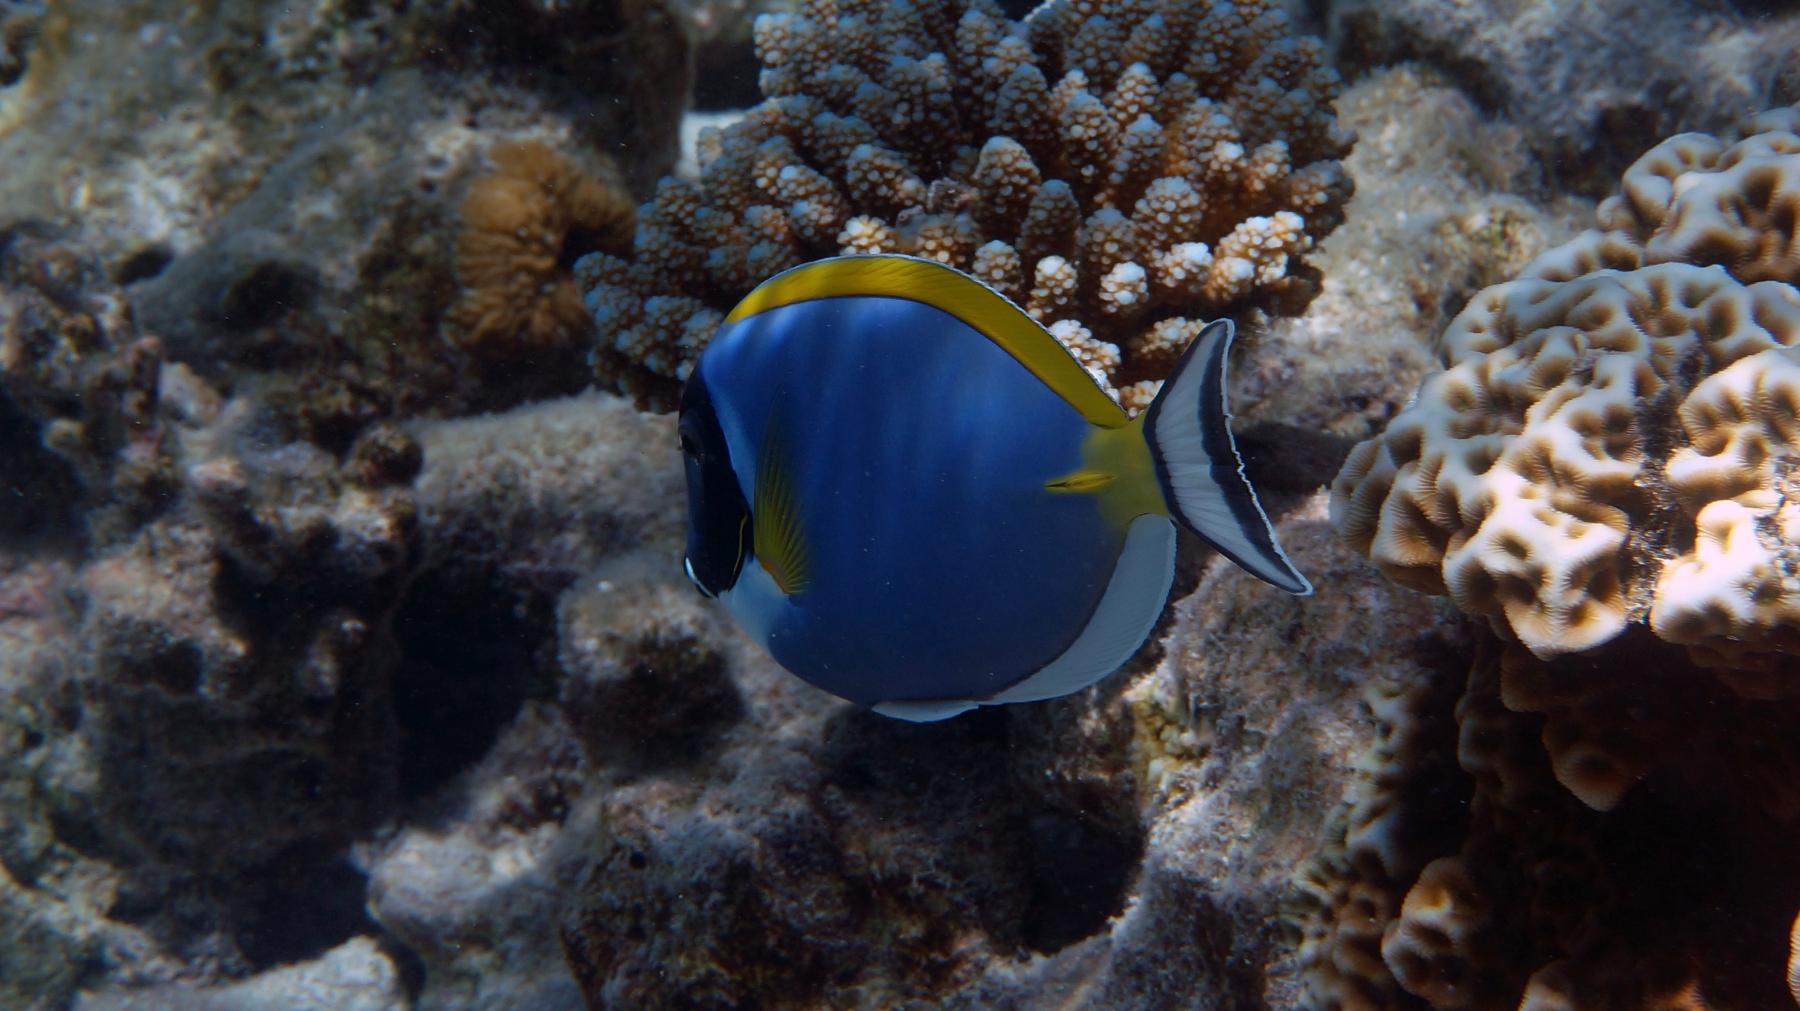 Acanthurus_leucosternon_011_C_Peces-Cirujano_L_Maldivas_U_Sebas_04072015